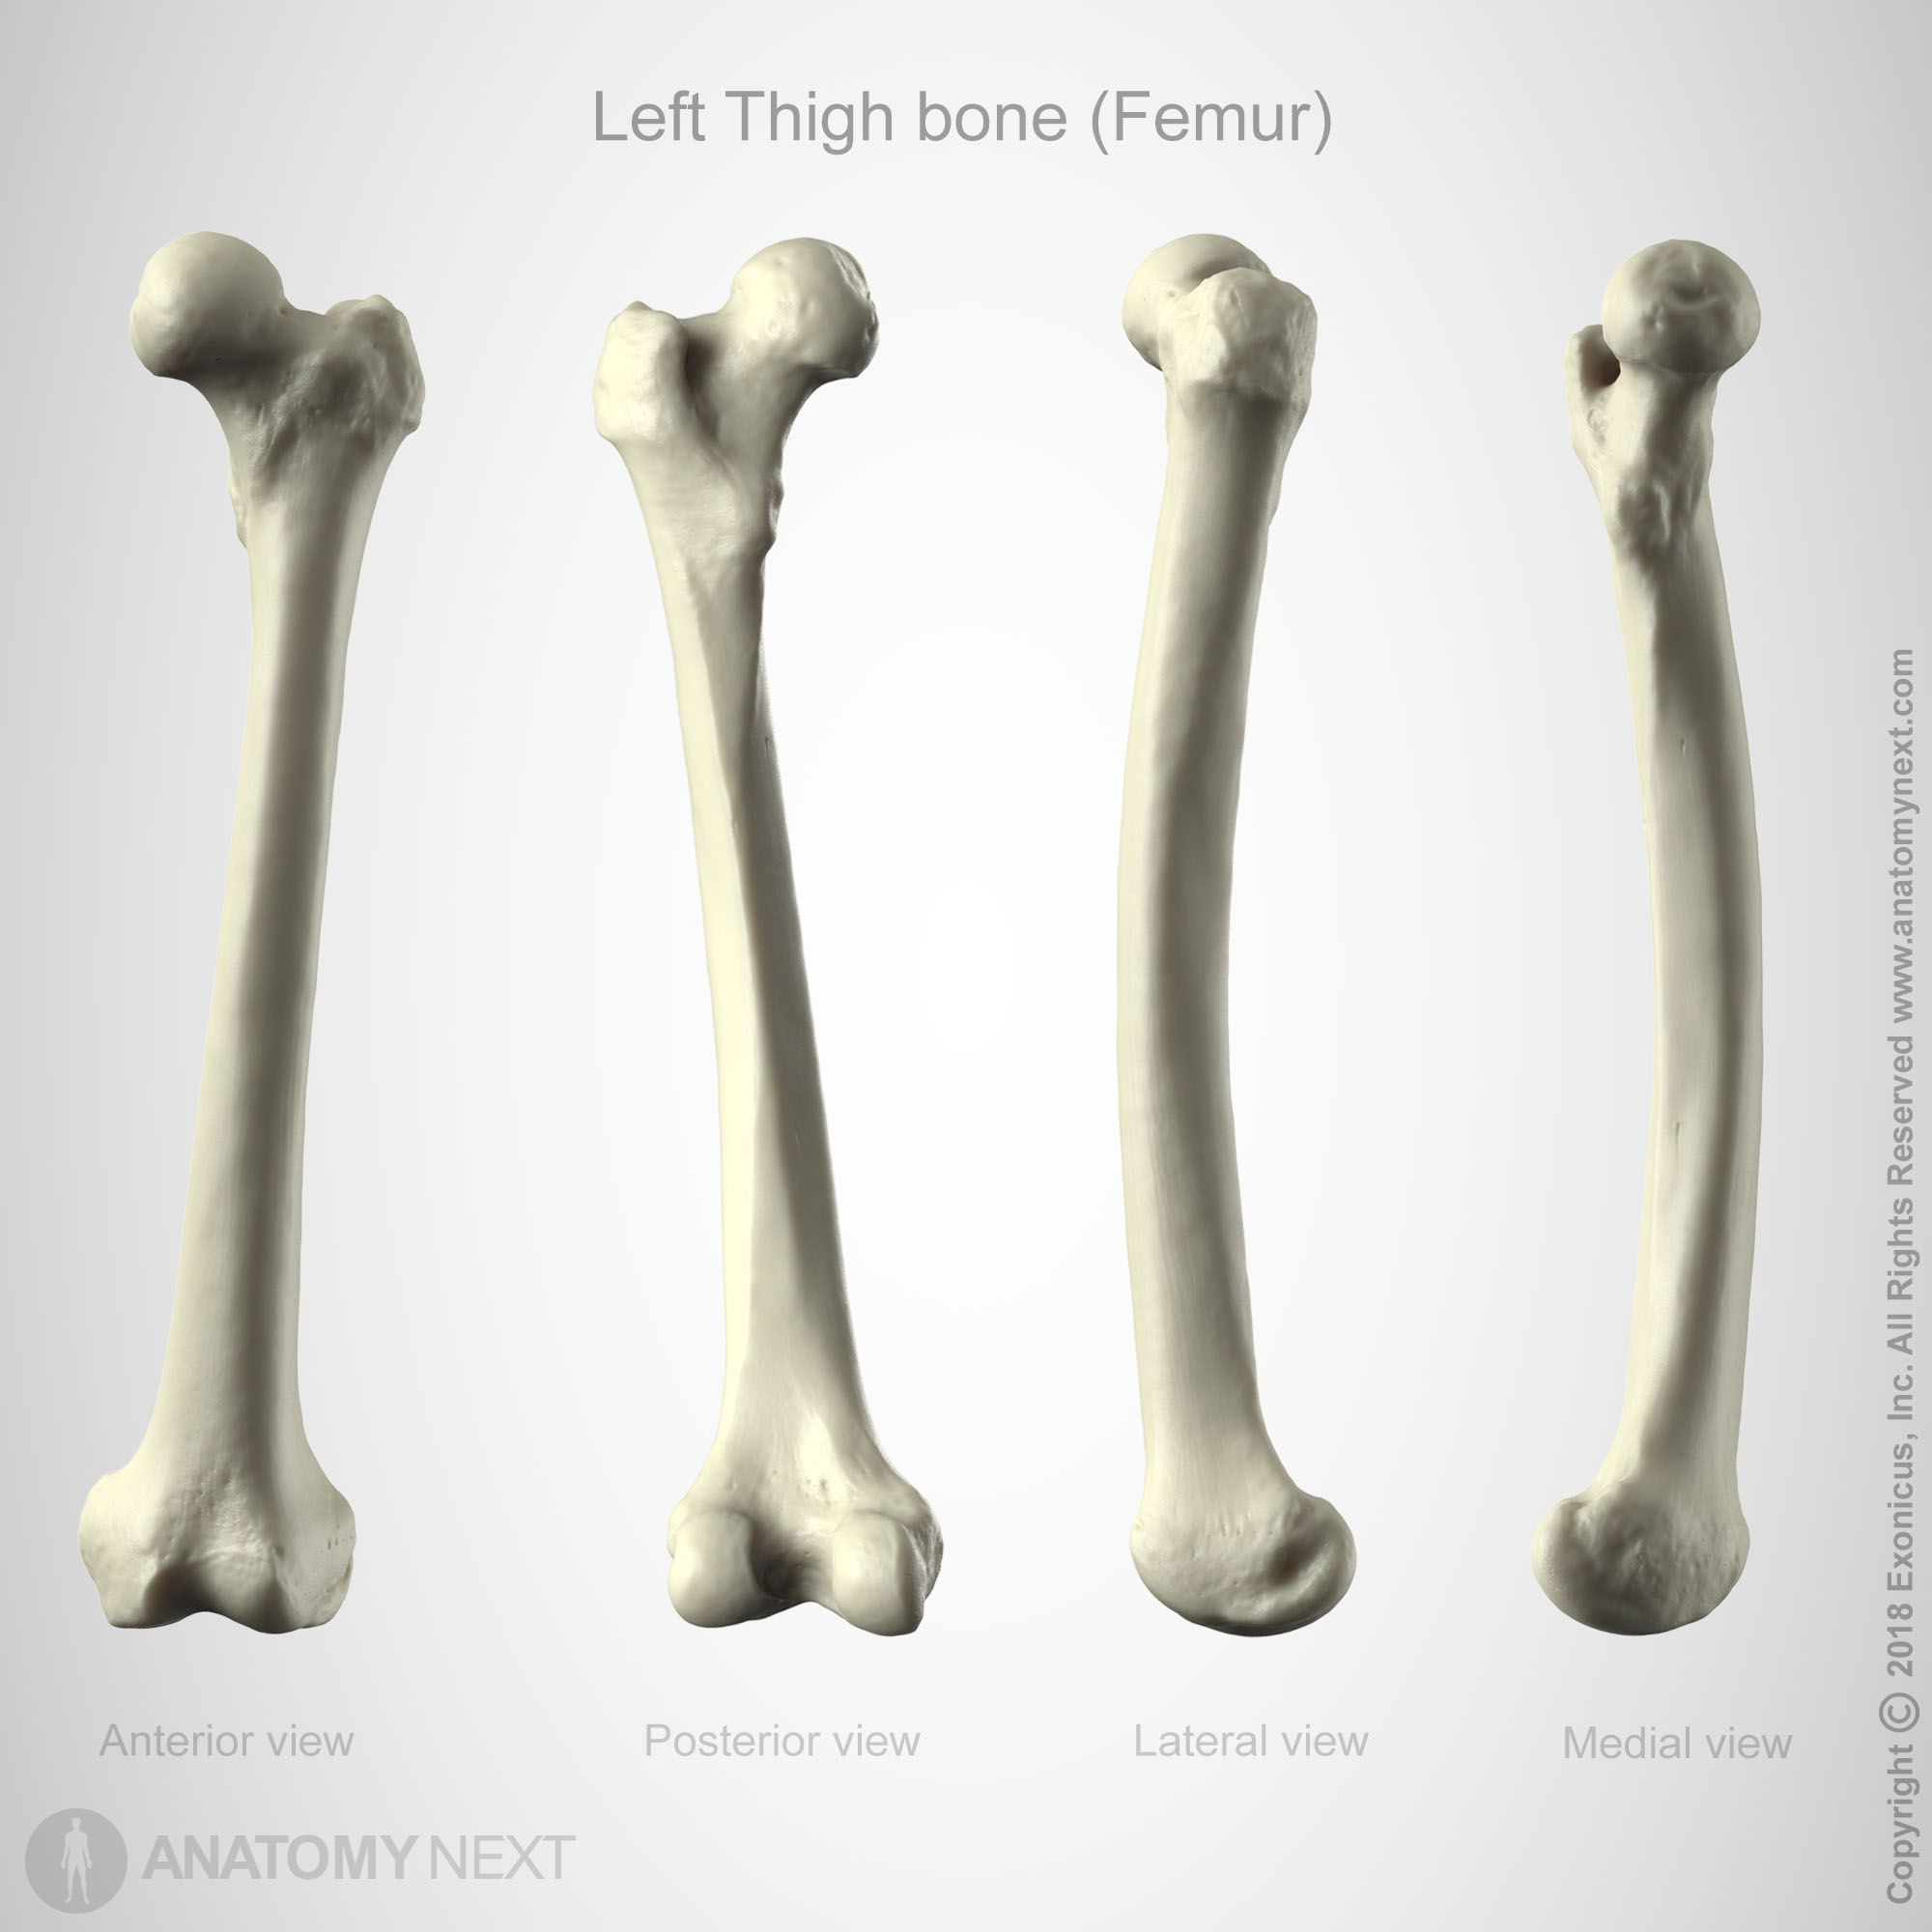 Anatomy 3danatomy Art Anatomynext Femur Bone Anatomy Next